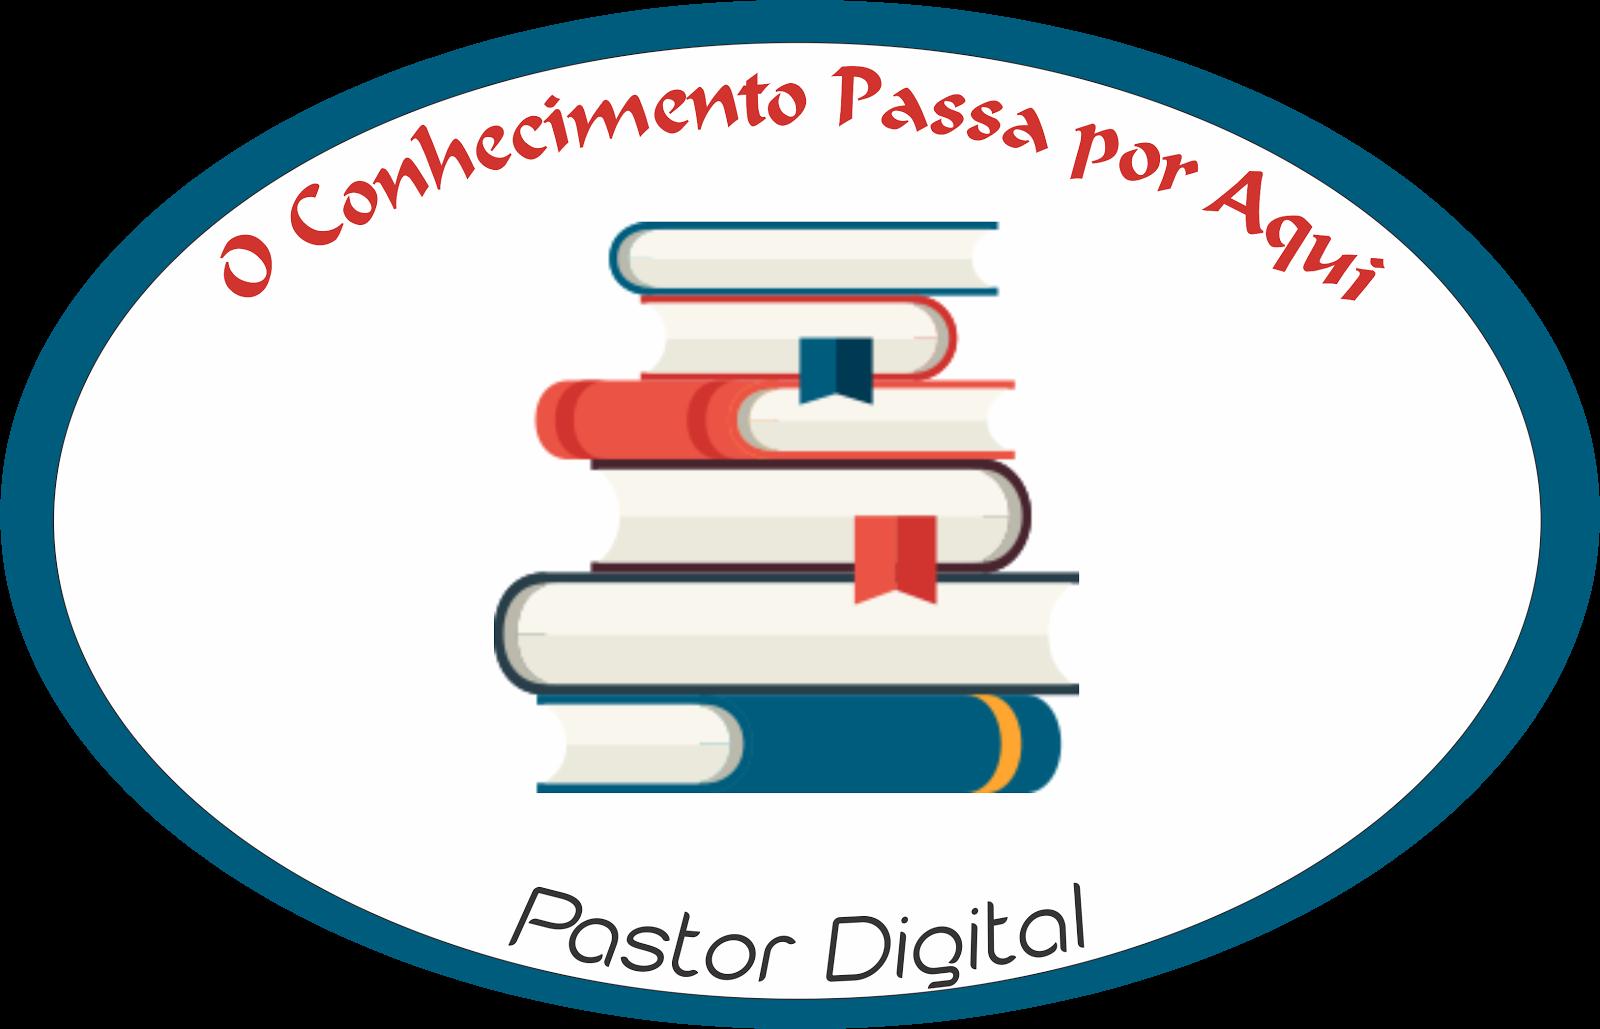 Pastor Digital